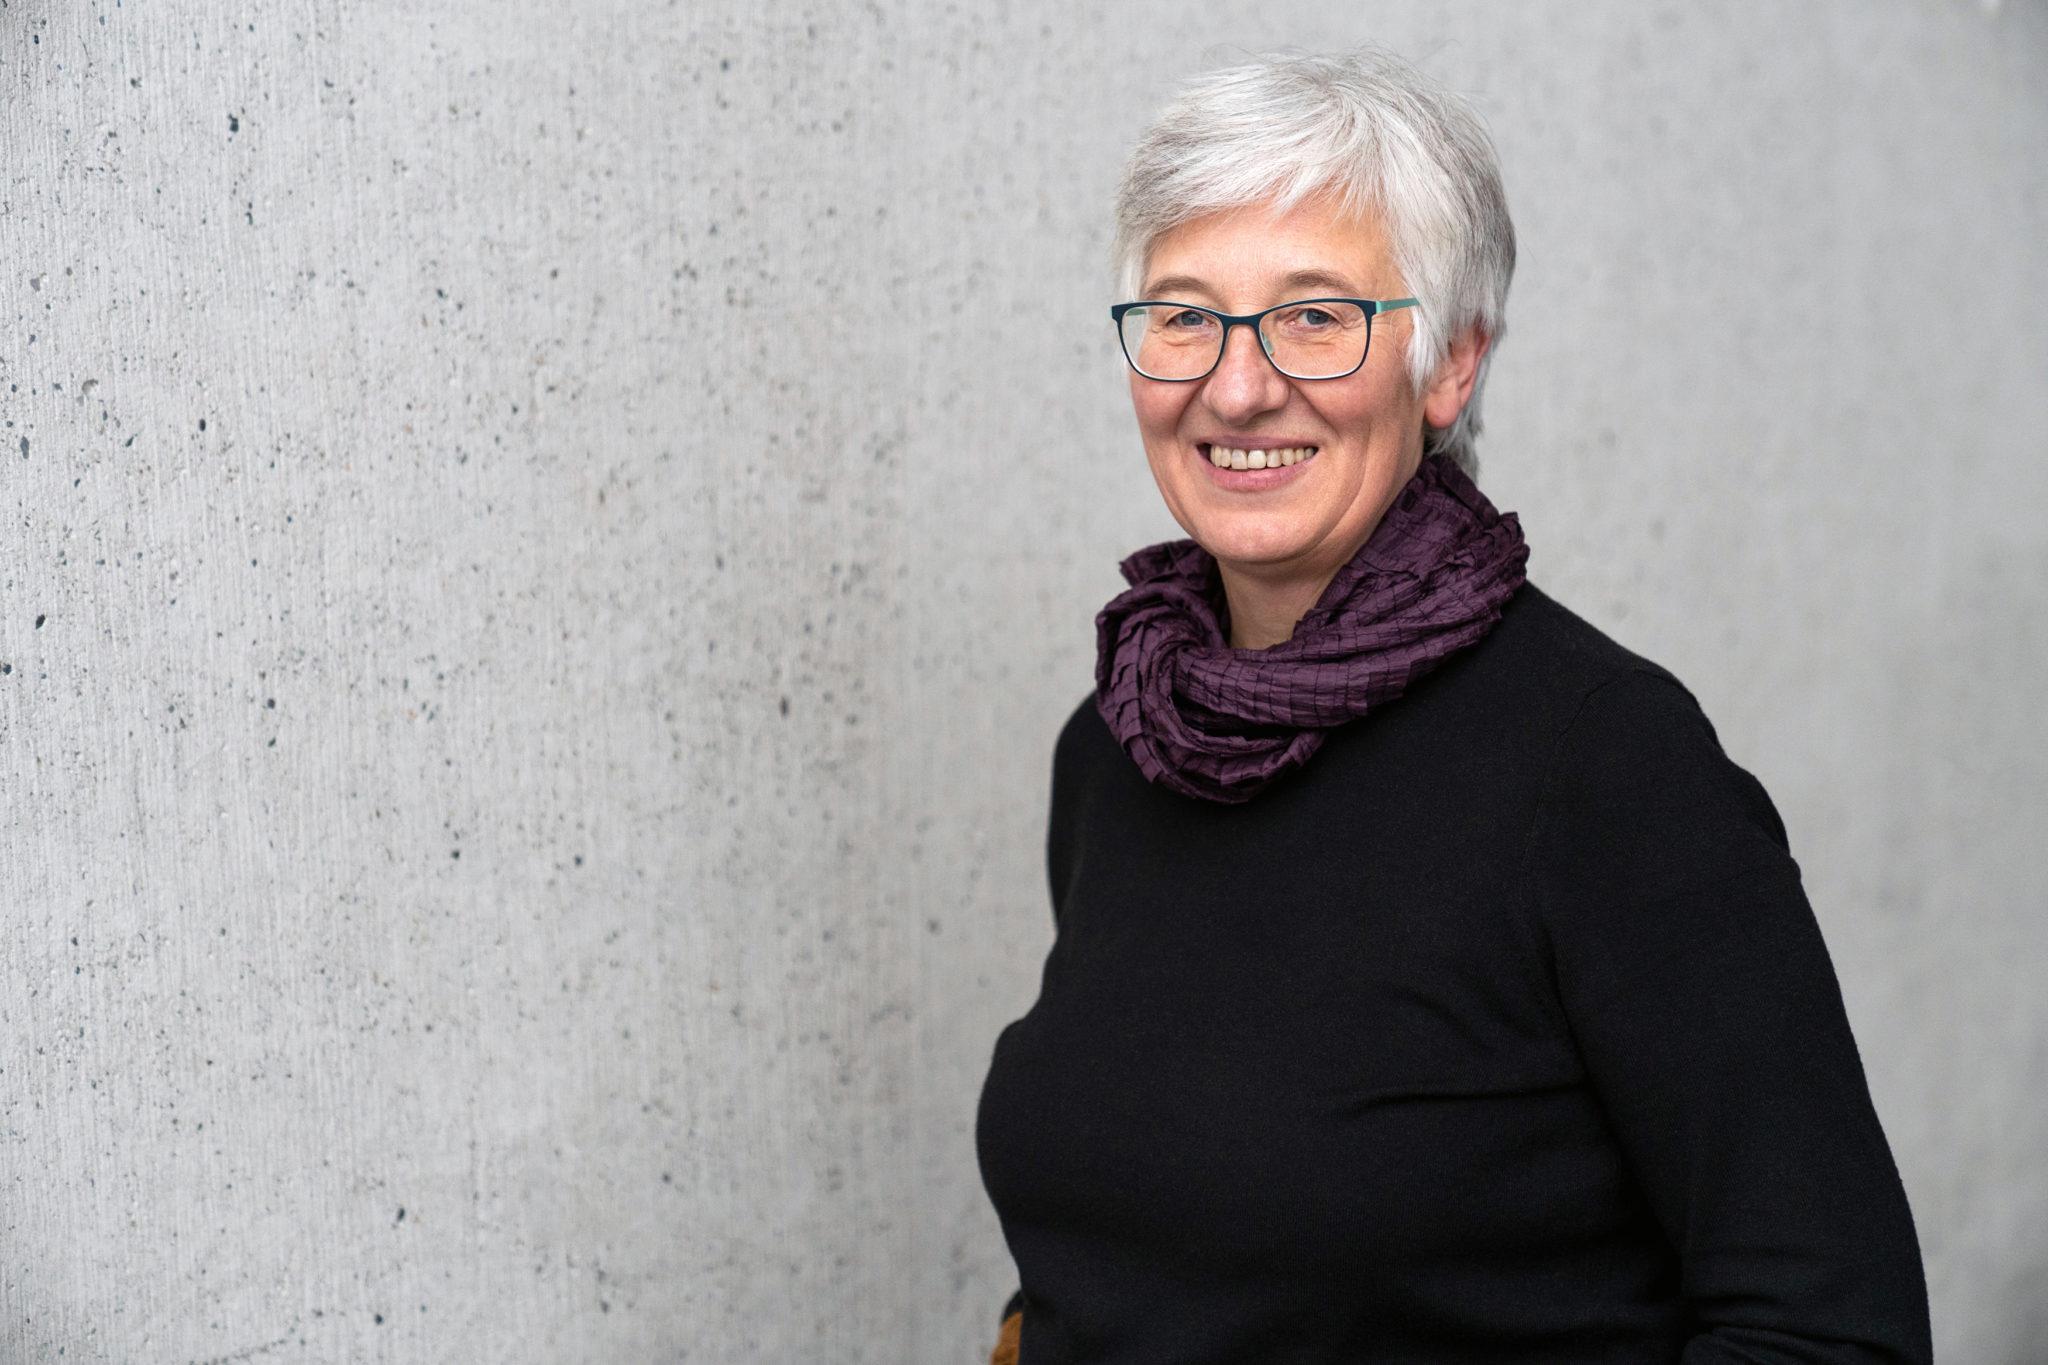 https://urbanes-lernen.obnf.de/wp-content/uploads/2020/11/Irene_Schumacher-WS-12-GMK-scaled.jpg